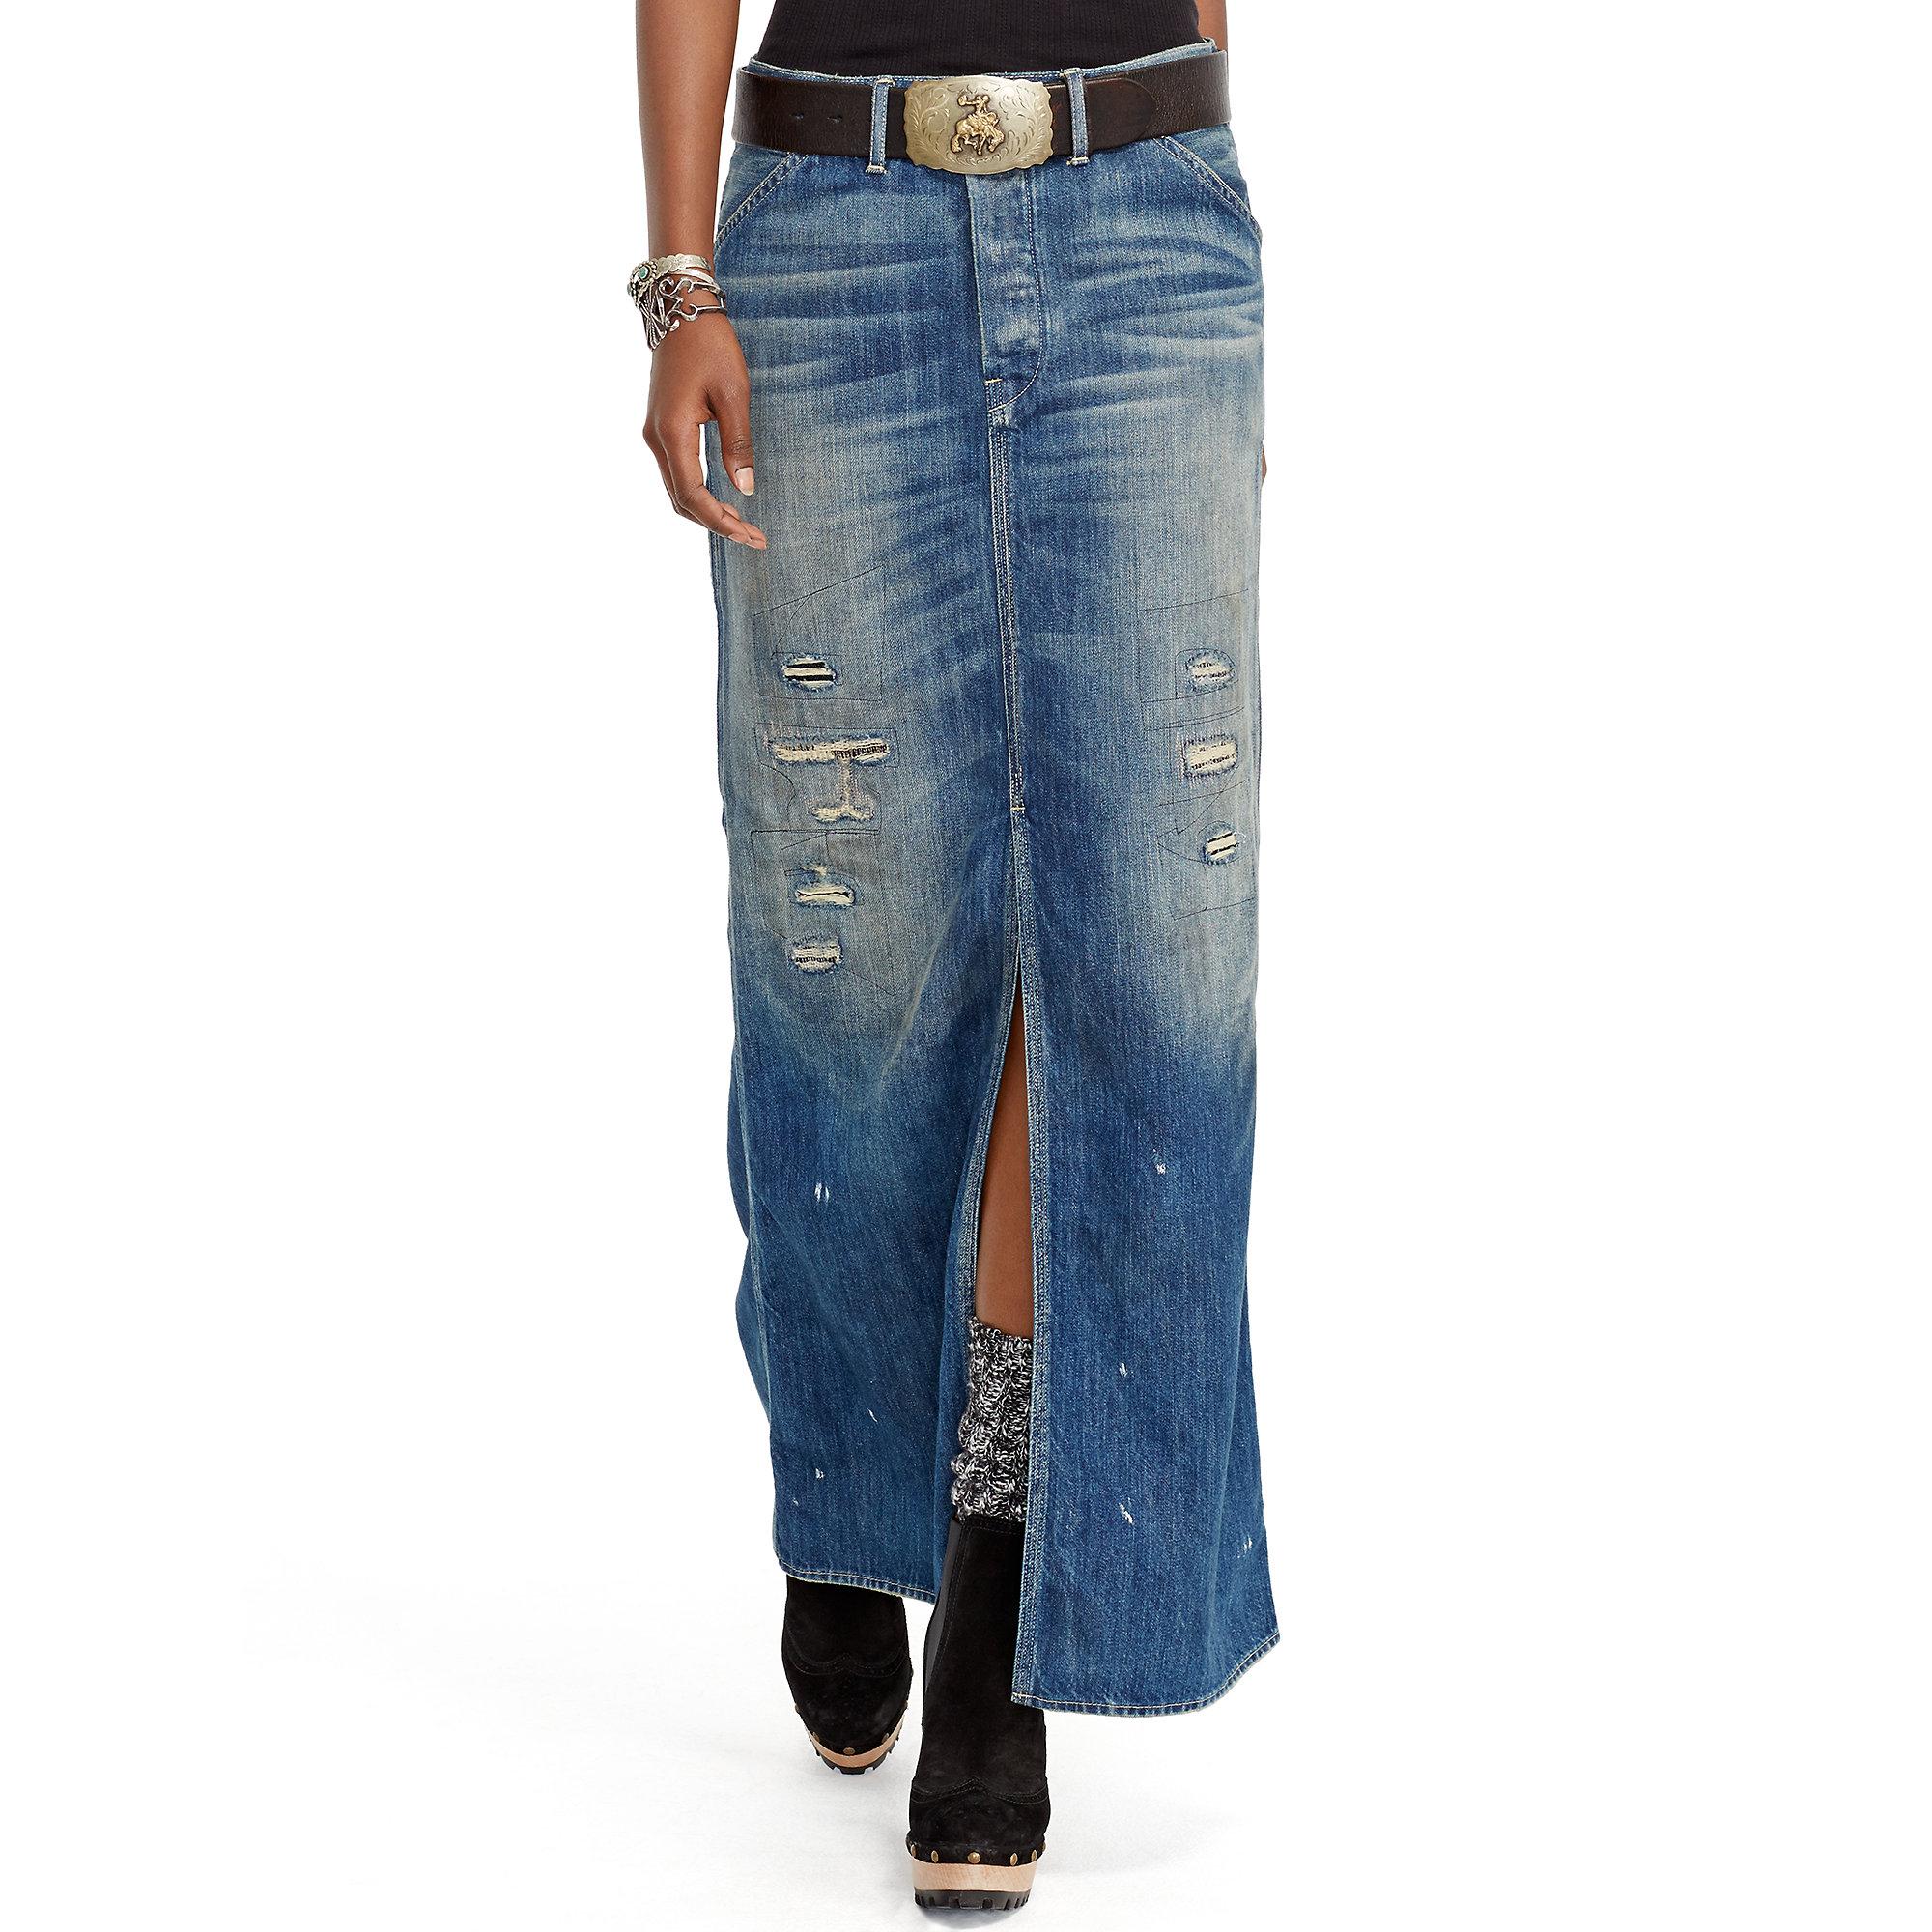 Polo ralph lauren Repaired Denim Maxiskirt in Blue   Lyst